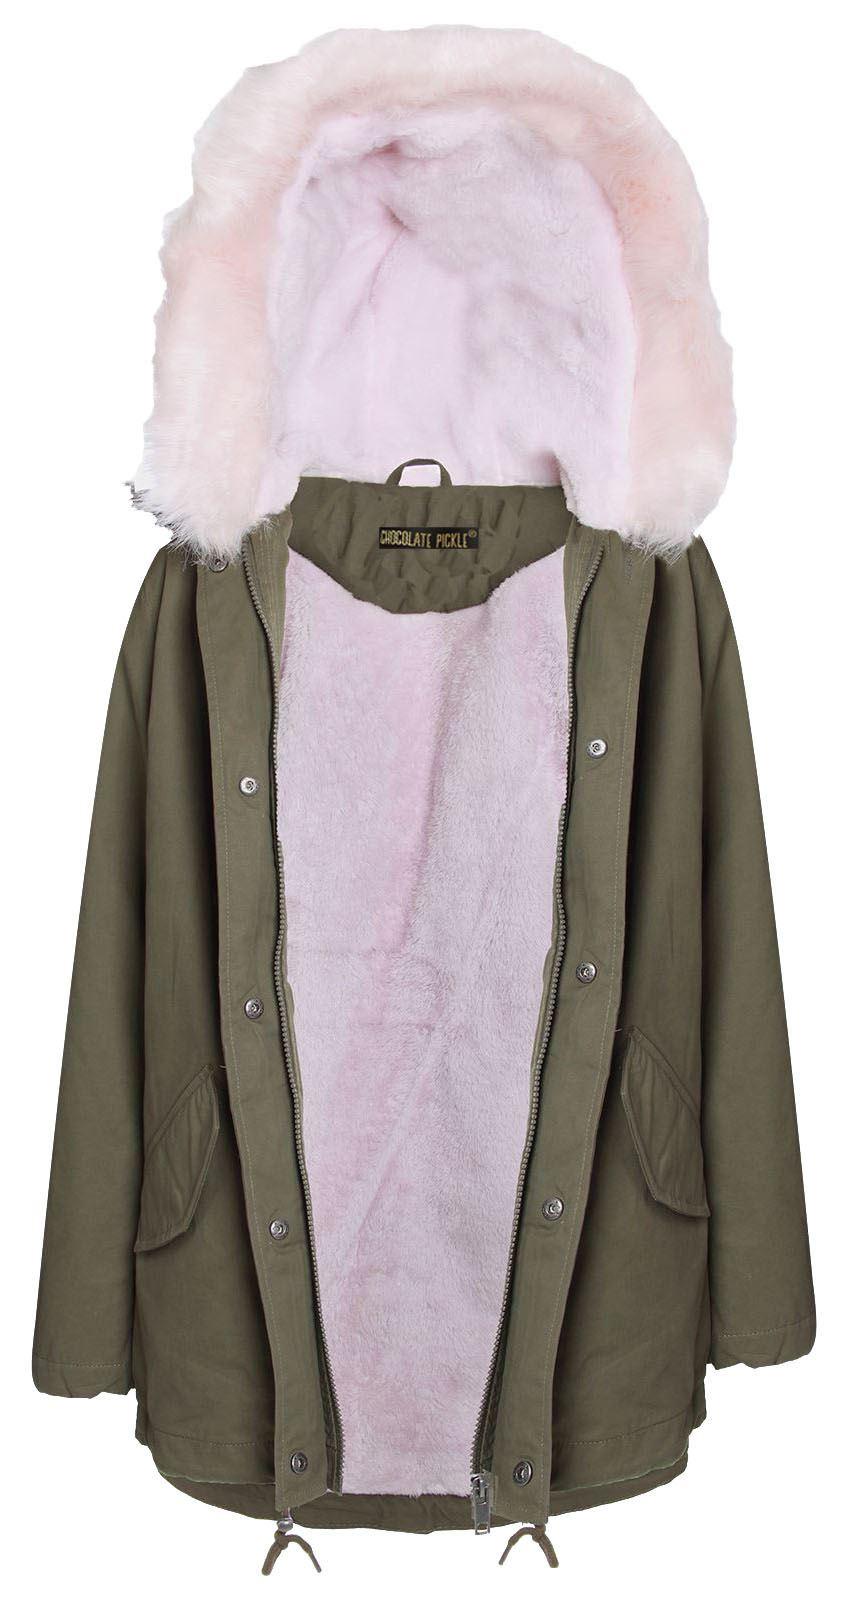 New Ladies Pale Pink Fur Sherpa Hooded Parka Coat Winter Jacket 8 ...